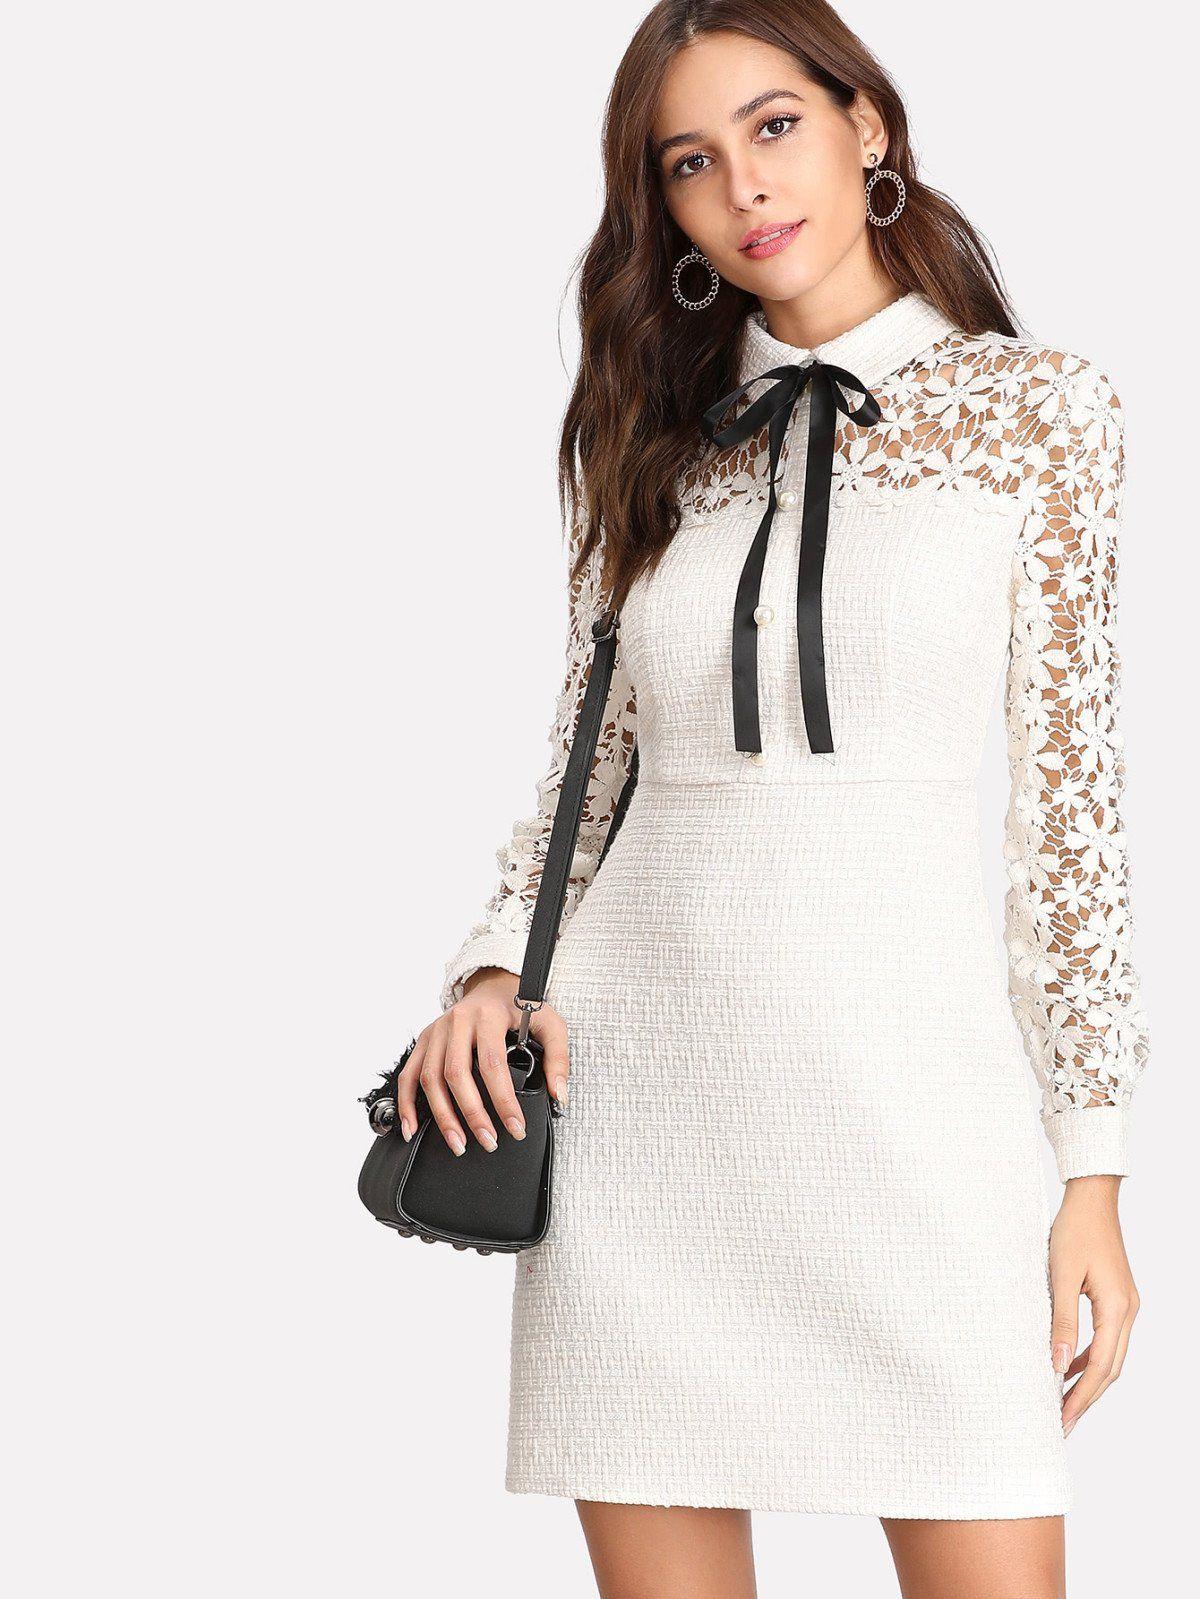 Daisy lace sleeve tie neck tweed dress zipper ties tweed dress